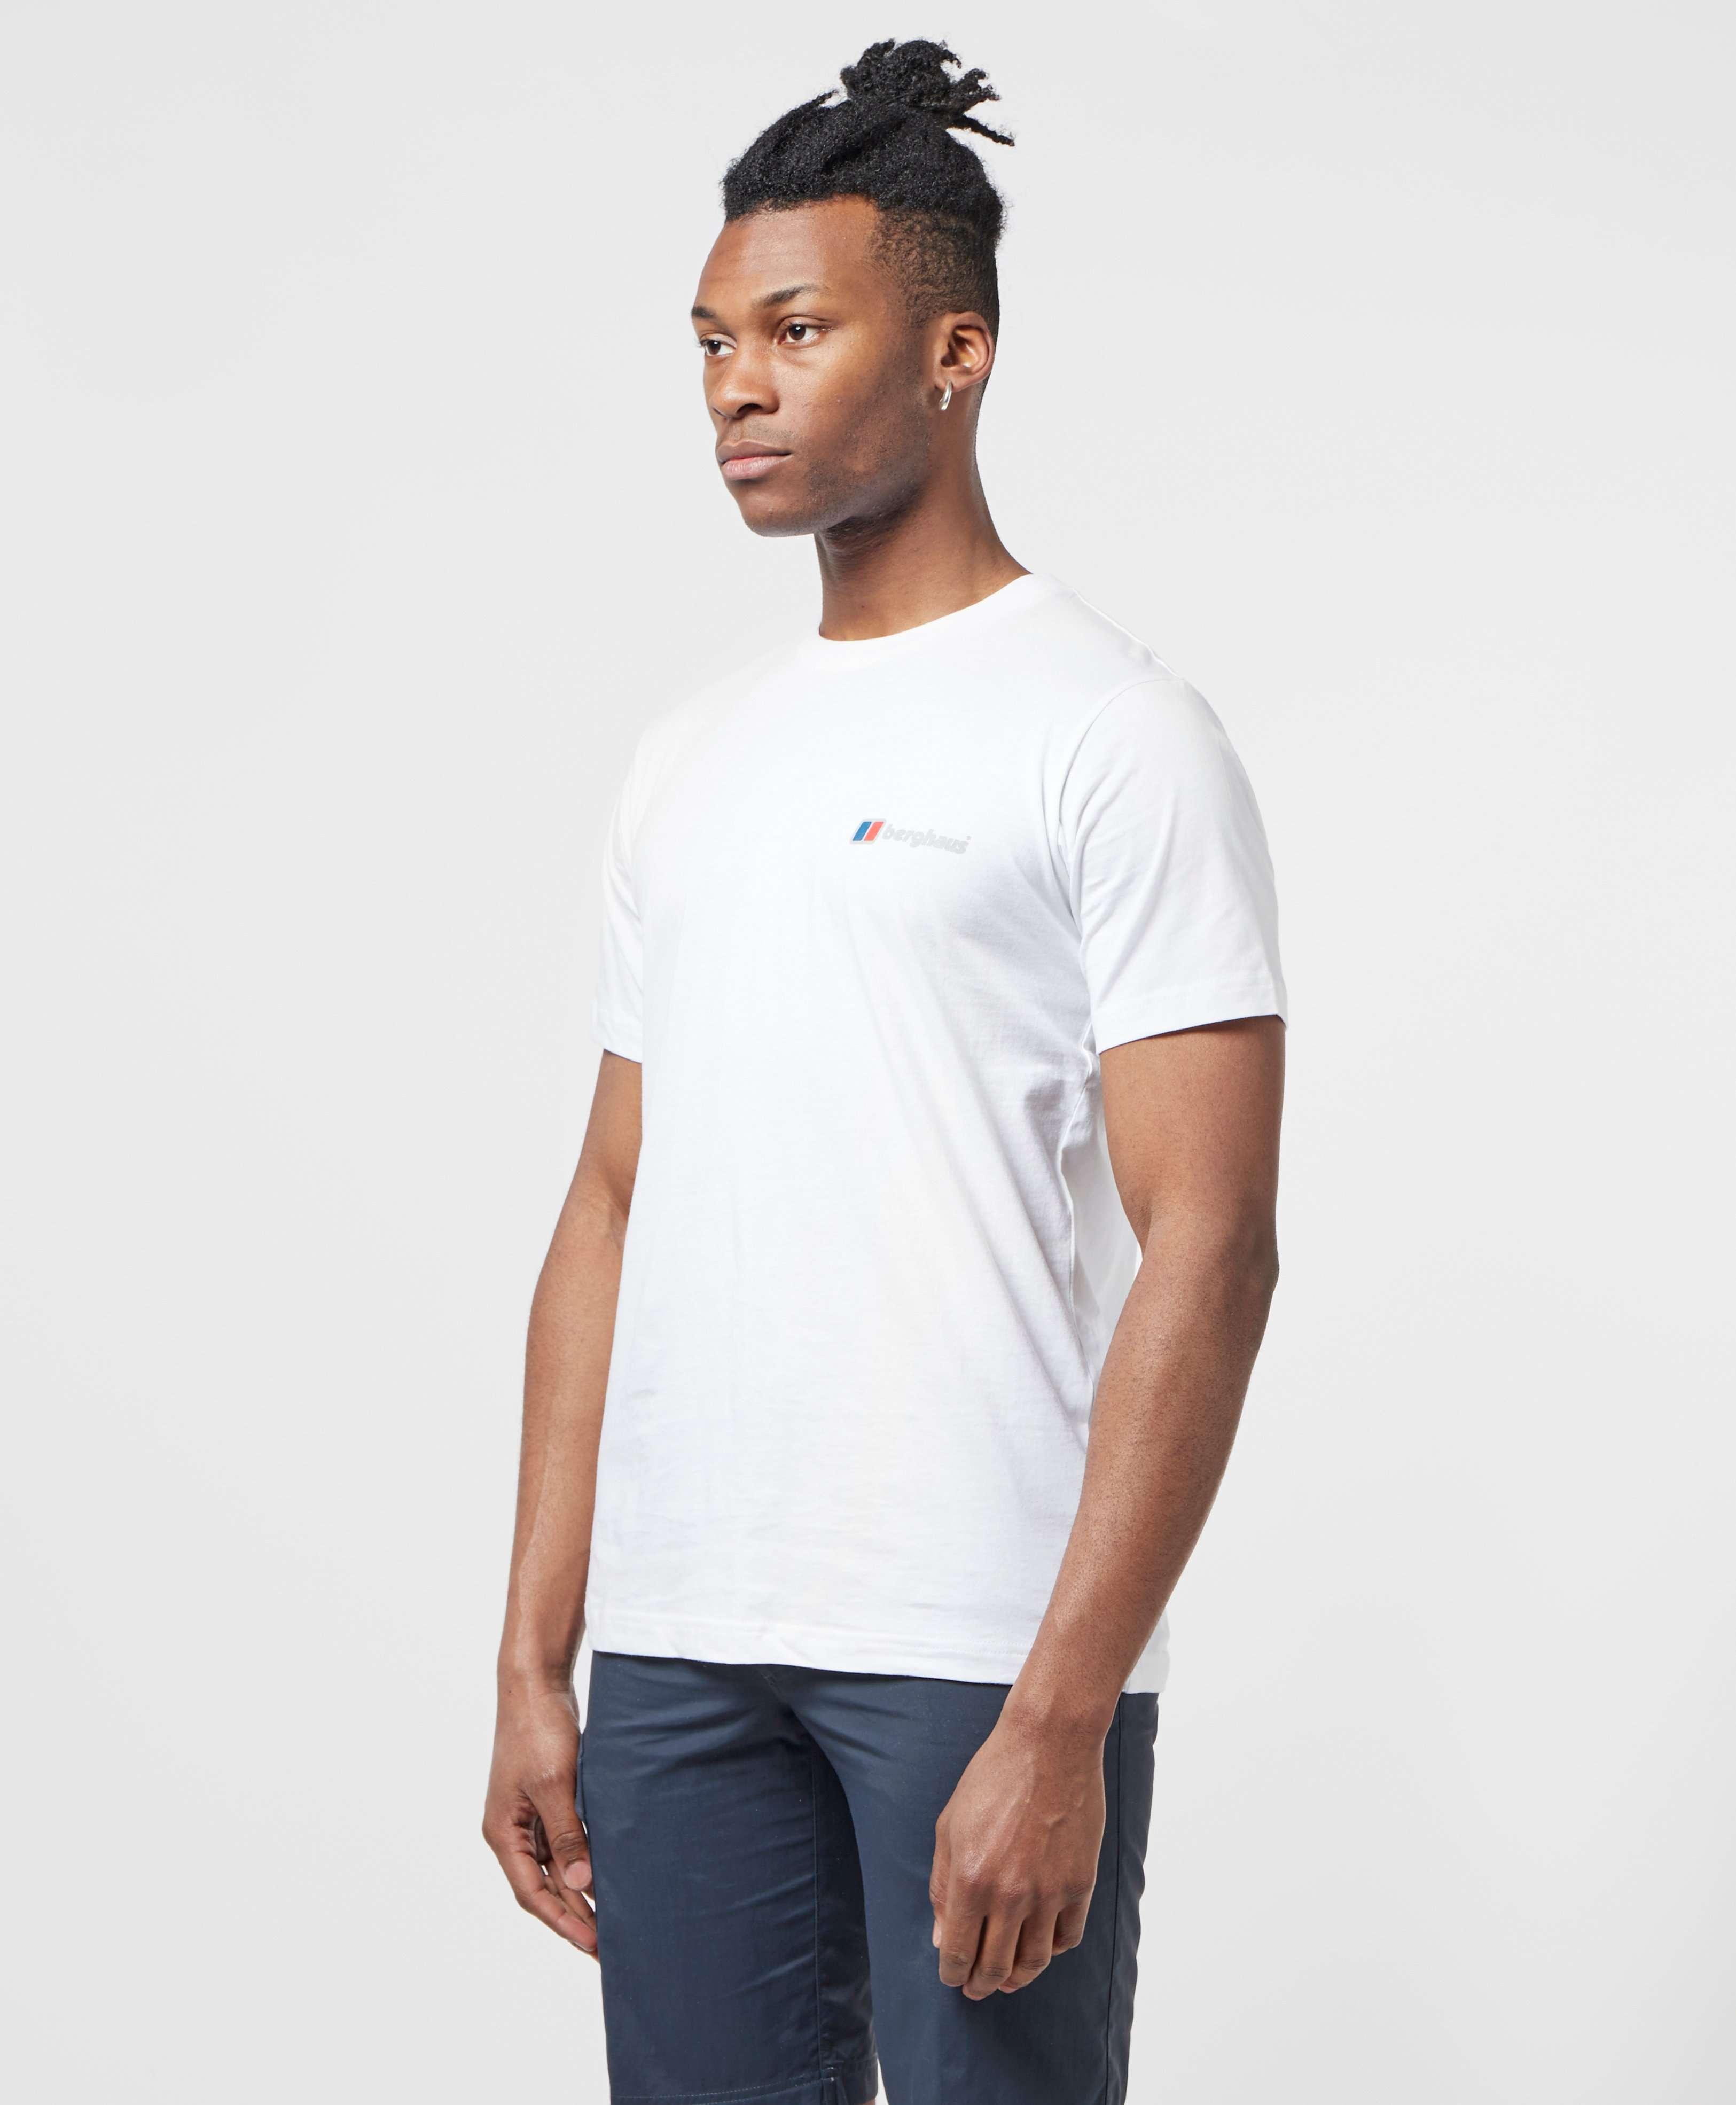 Berghaus Small Corporate Logo Short Sleeve T-Shirt